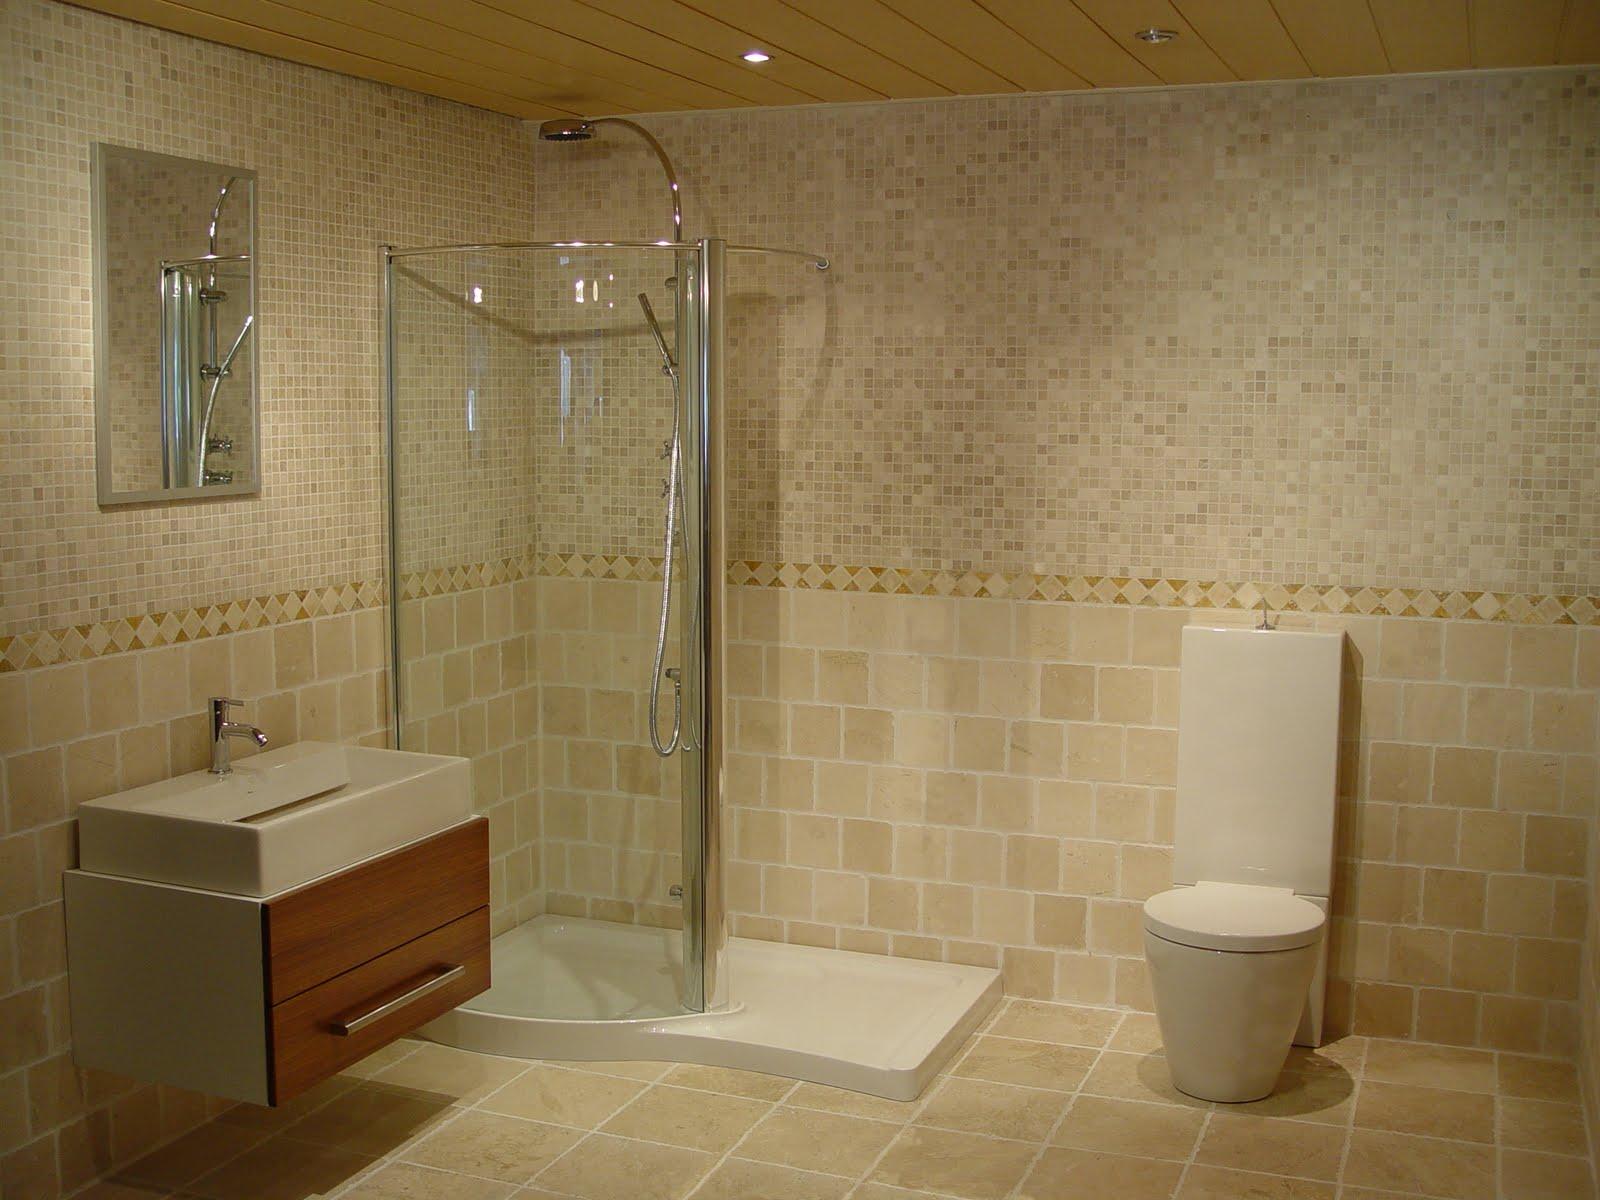 Art Wall Decor: Bathroom Wall Tiles Ideas on Bathroom Tile Designs  id=77647